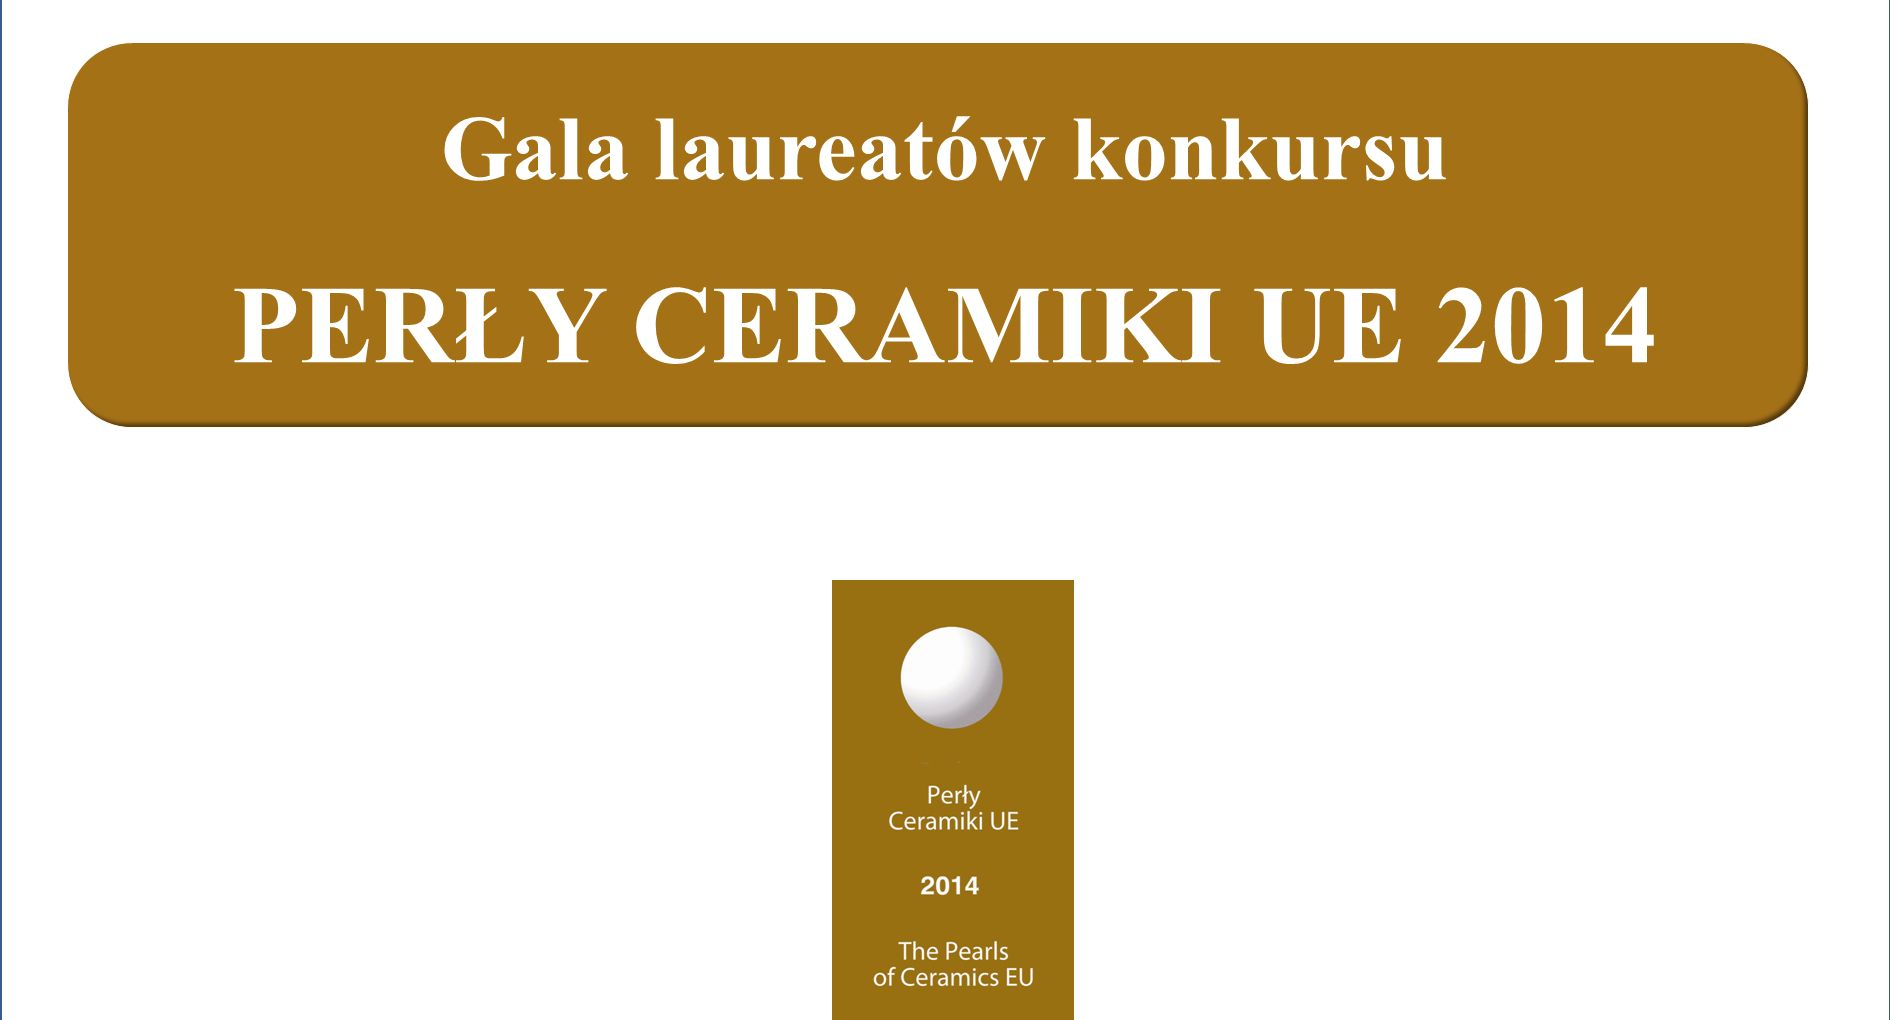 Gala laureatów konkursu PERŁY CERAMIKI UE 2014